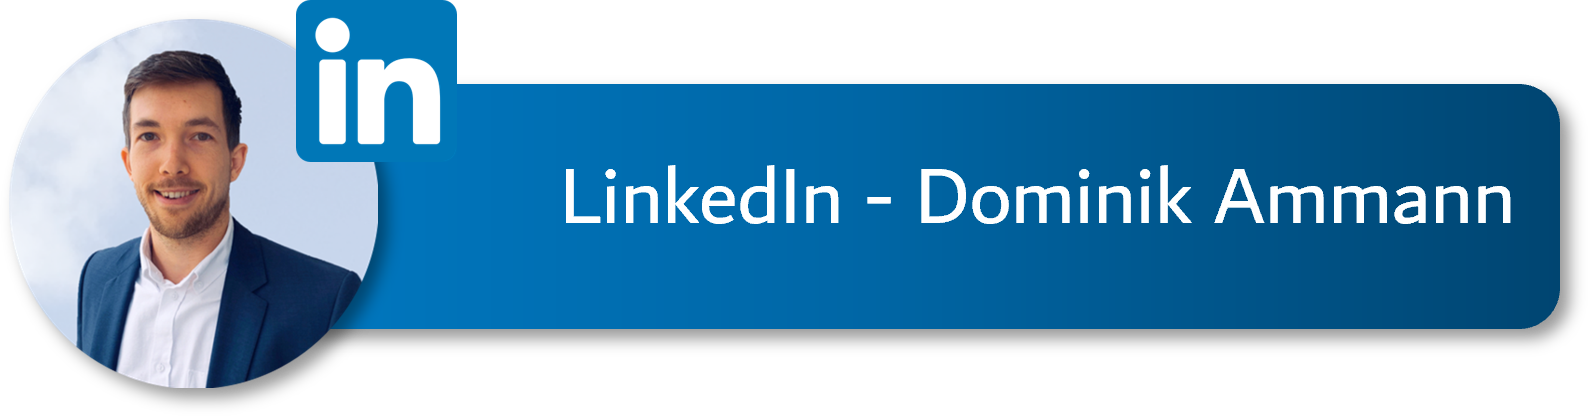 Button LinkedIn – Dominik Ammann